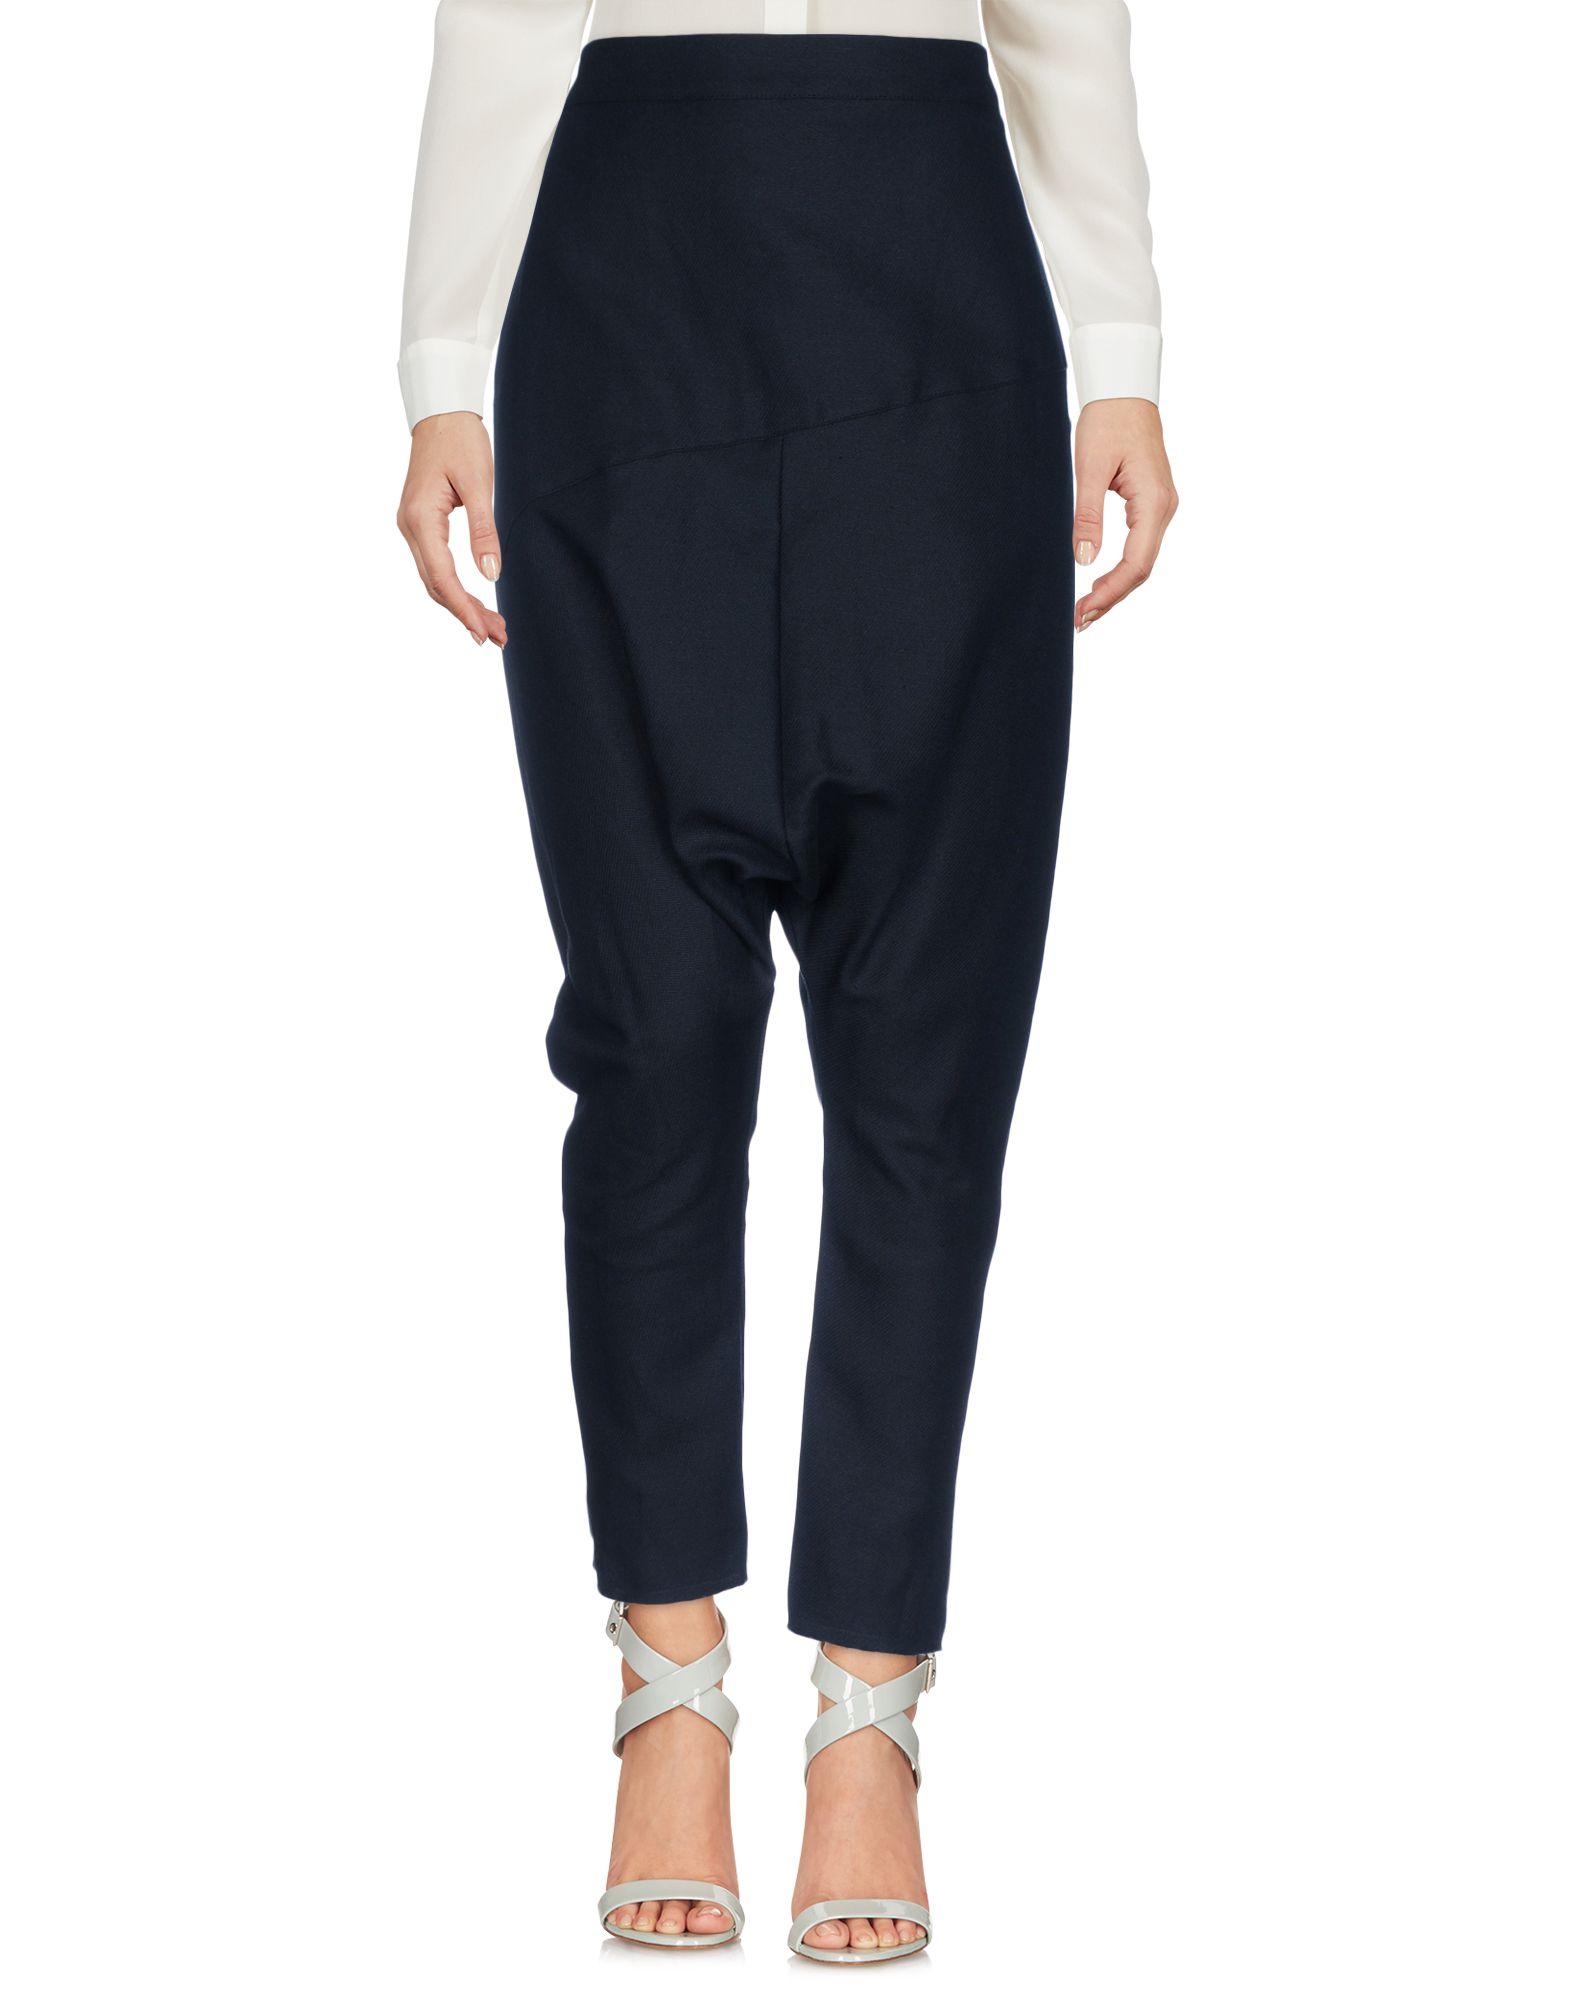 Pantalone Nostrasantissima Donna - Acquista online su Yw5kaJEo